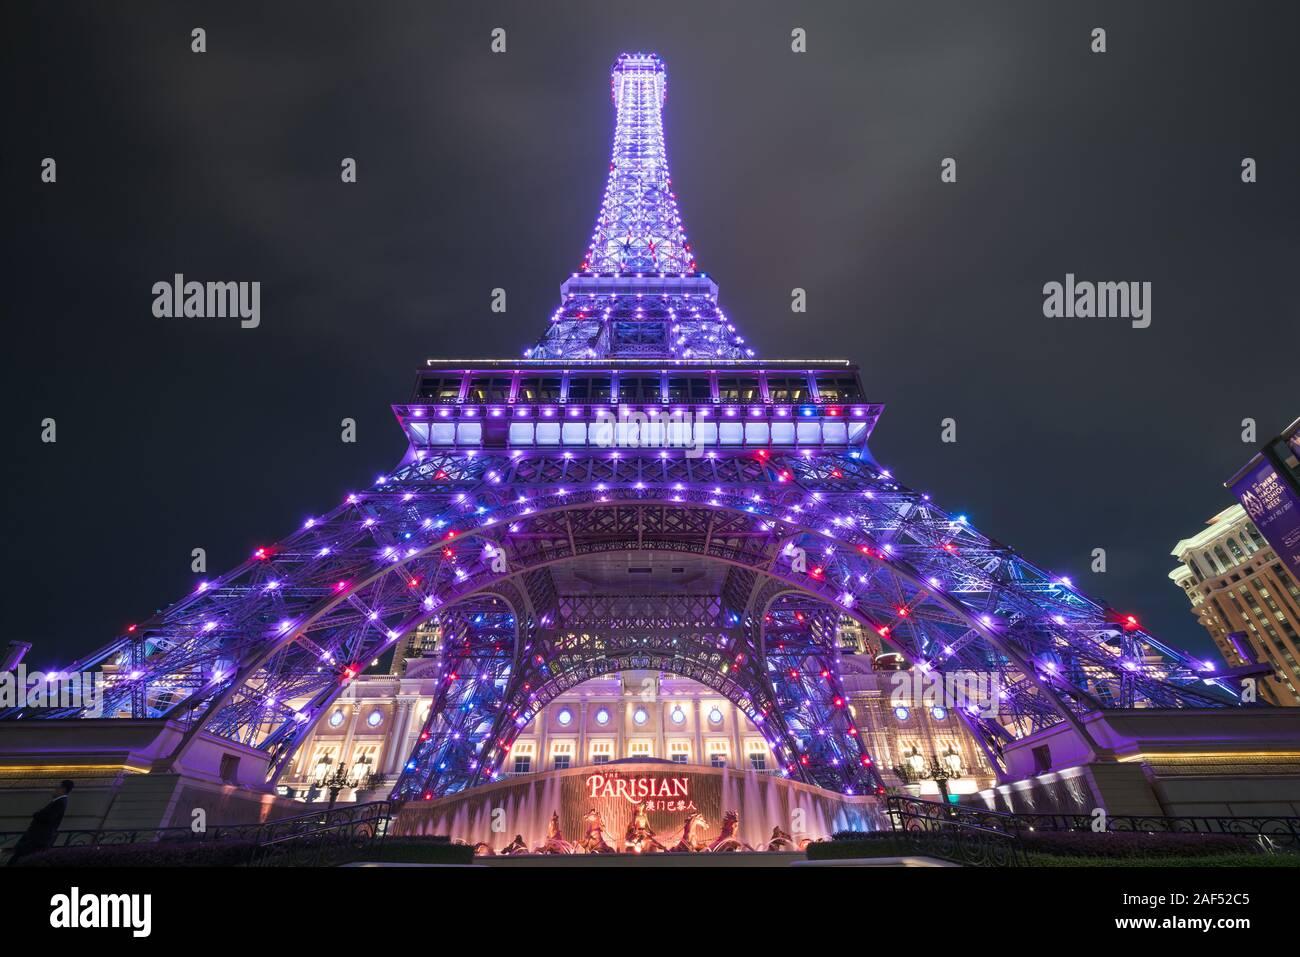 Macau, China - October 15, 2017 : Macau Eiffel Tower, icon of The Parisian, a luxury Resort Hotel Casino in Cotai Strip owned by Las Vegas Sands, shin Stock Photo